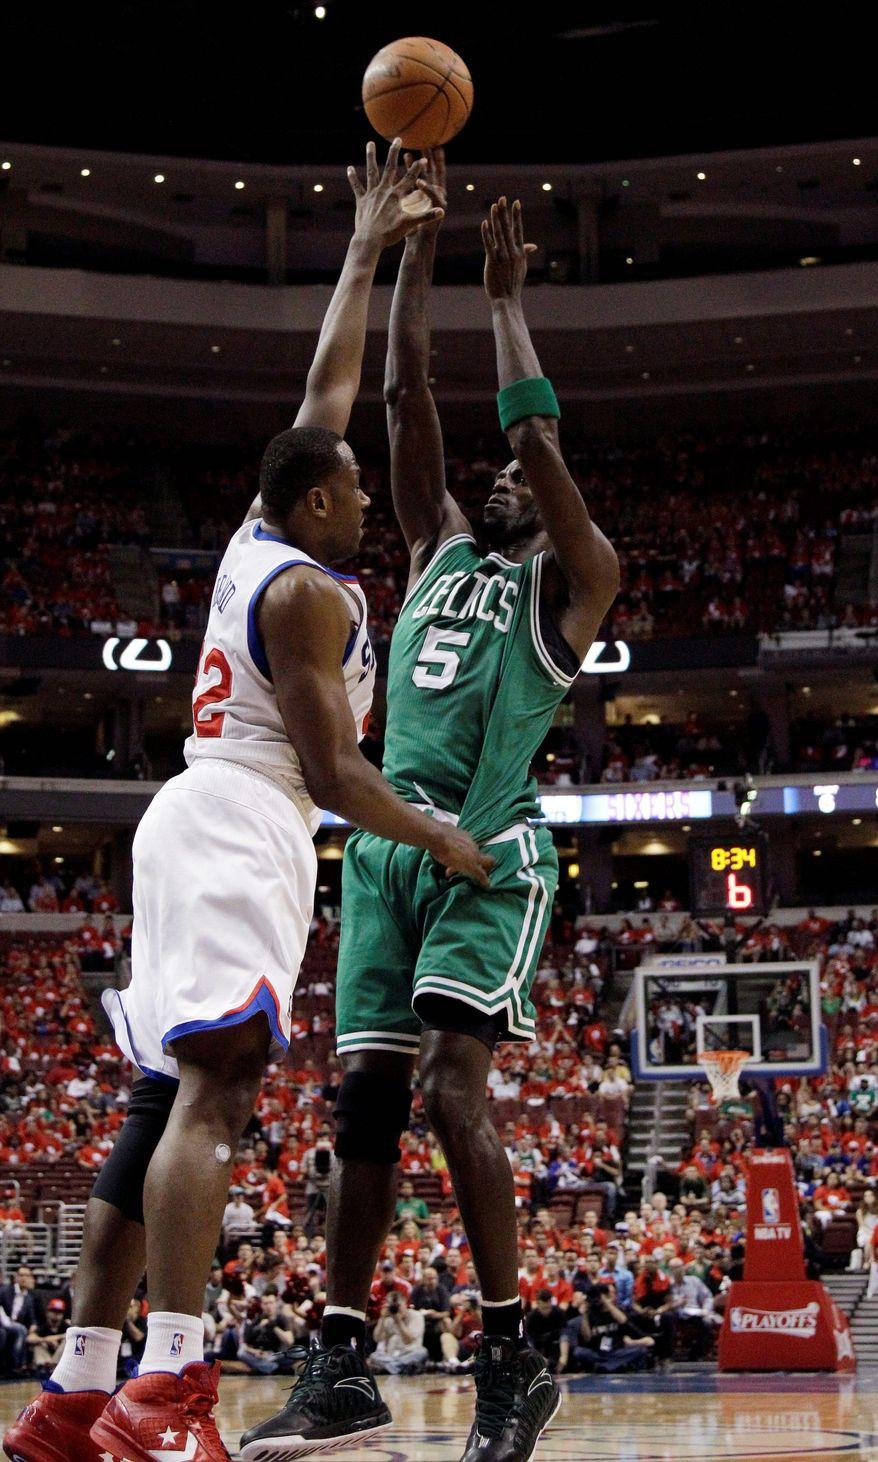 Boston's Kevin Garnett (5) shoots against Philadelphia's Elton Brand during Game 3. Garnett finished with 27 points and 13 rebounds in the Celtics' 107-91 win.